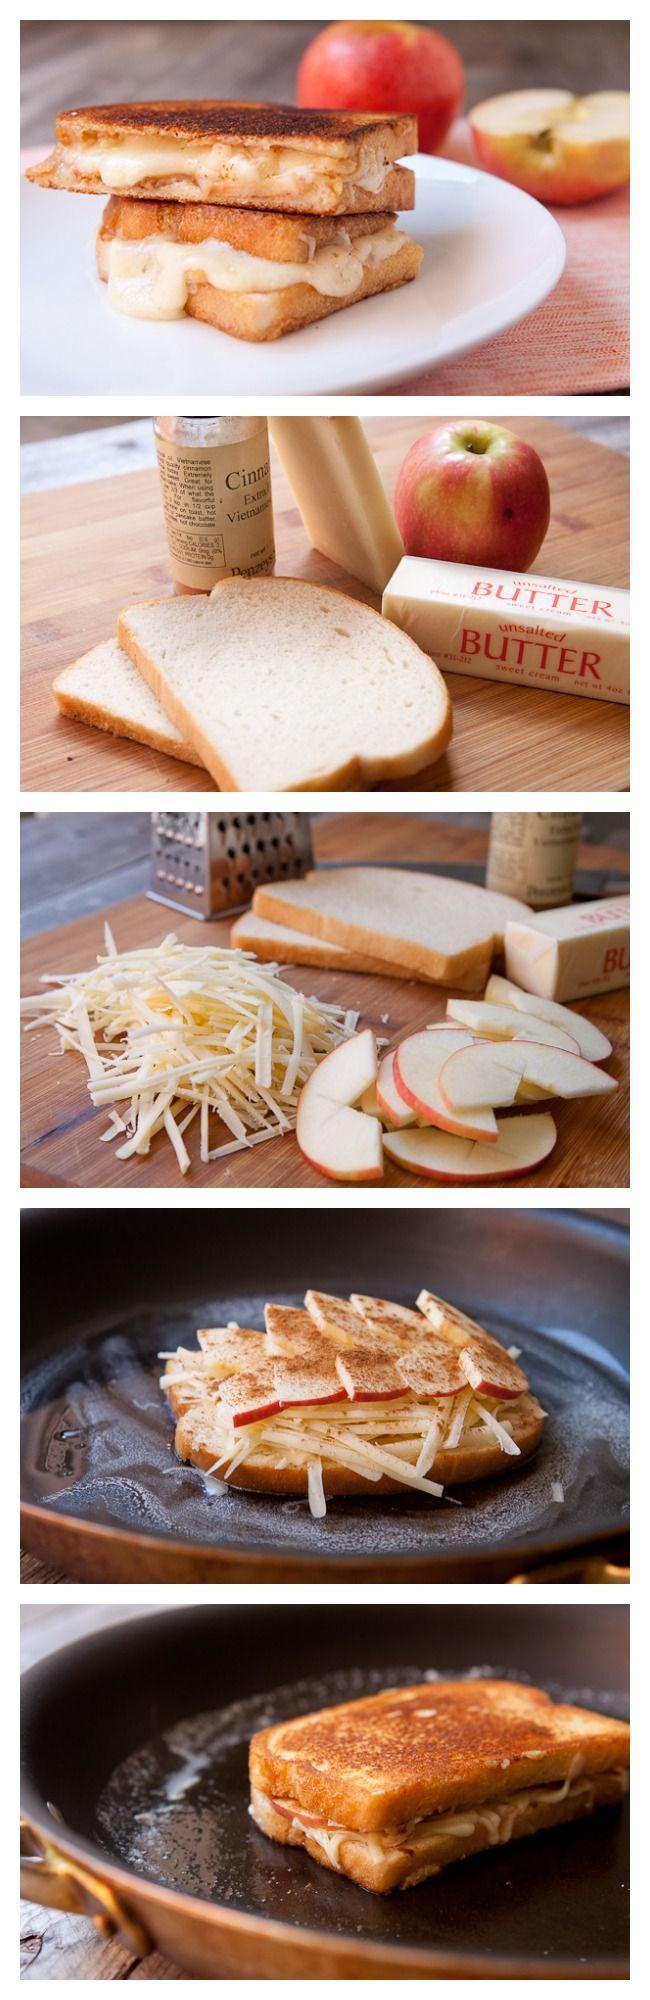 ... Recipes on Pinterest | Pumpkin Pies, Apple Pies and Caramel Apples